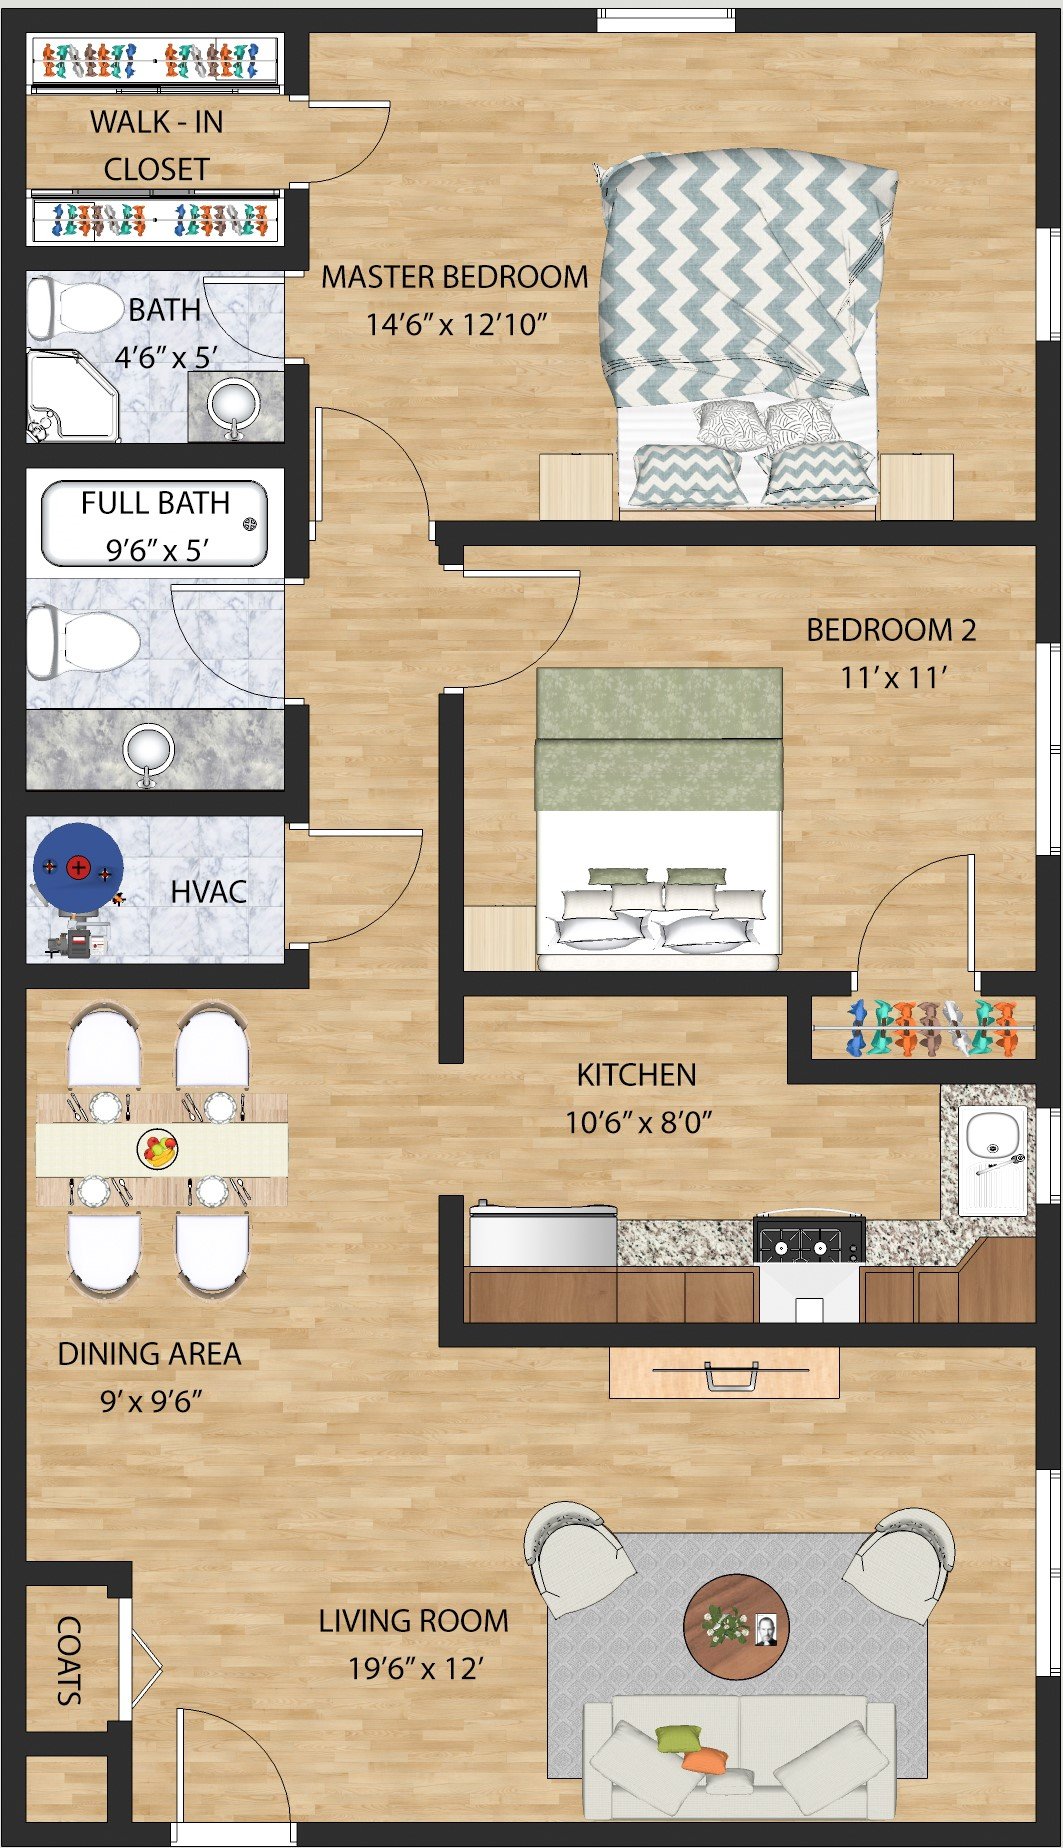 2_BR_2_Bath_Floor_Plan__Harbor.jpg